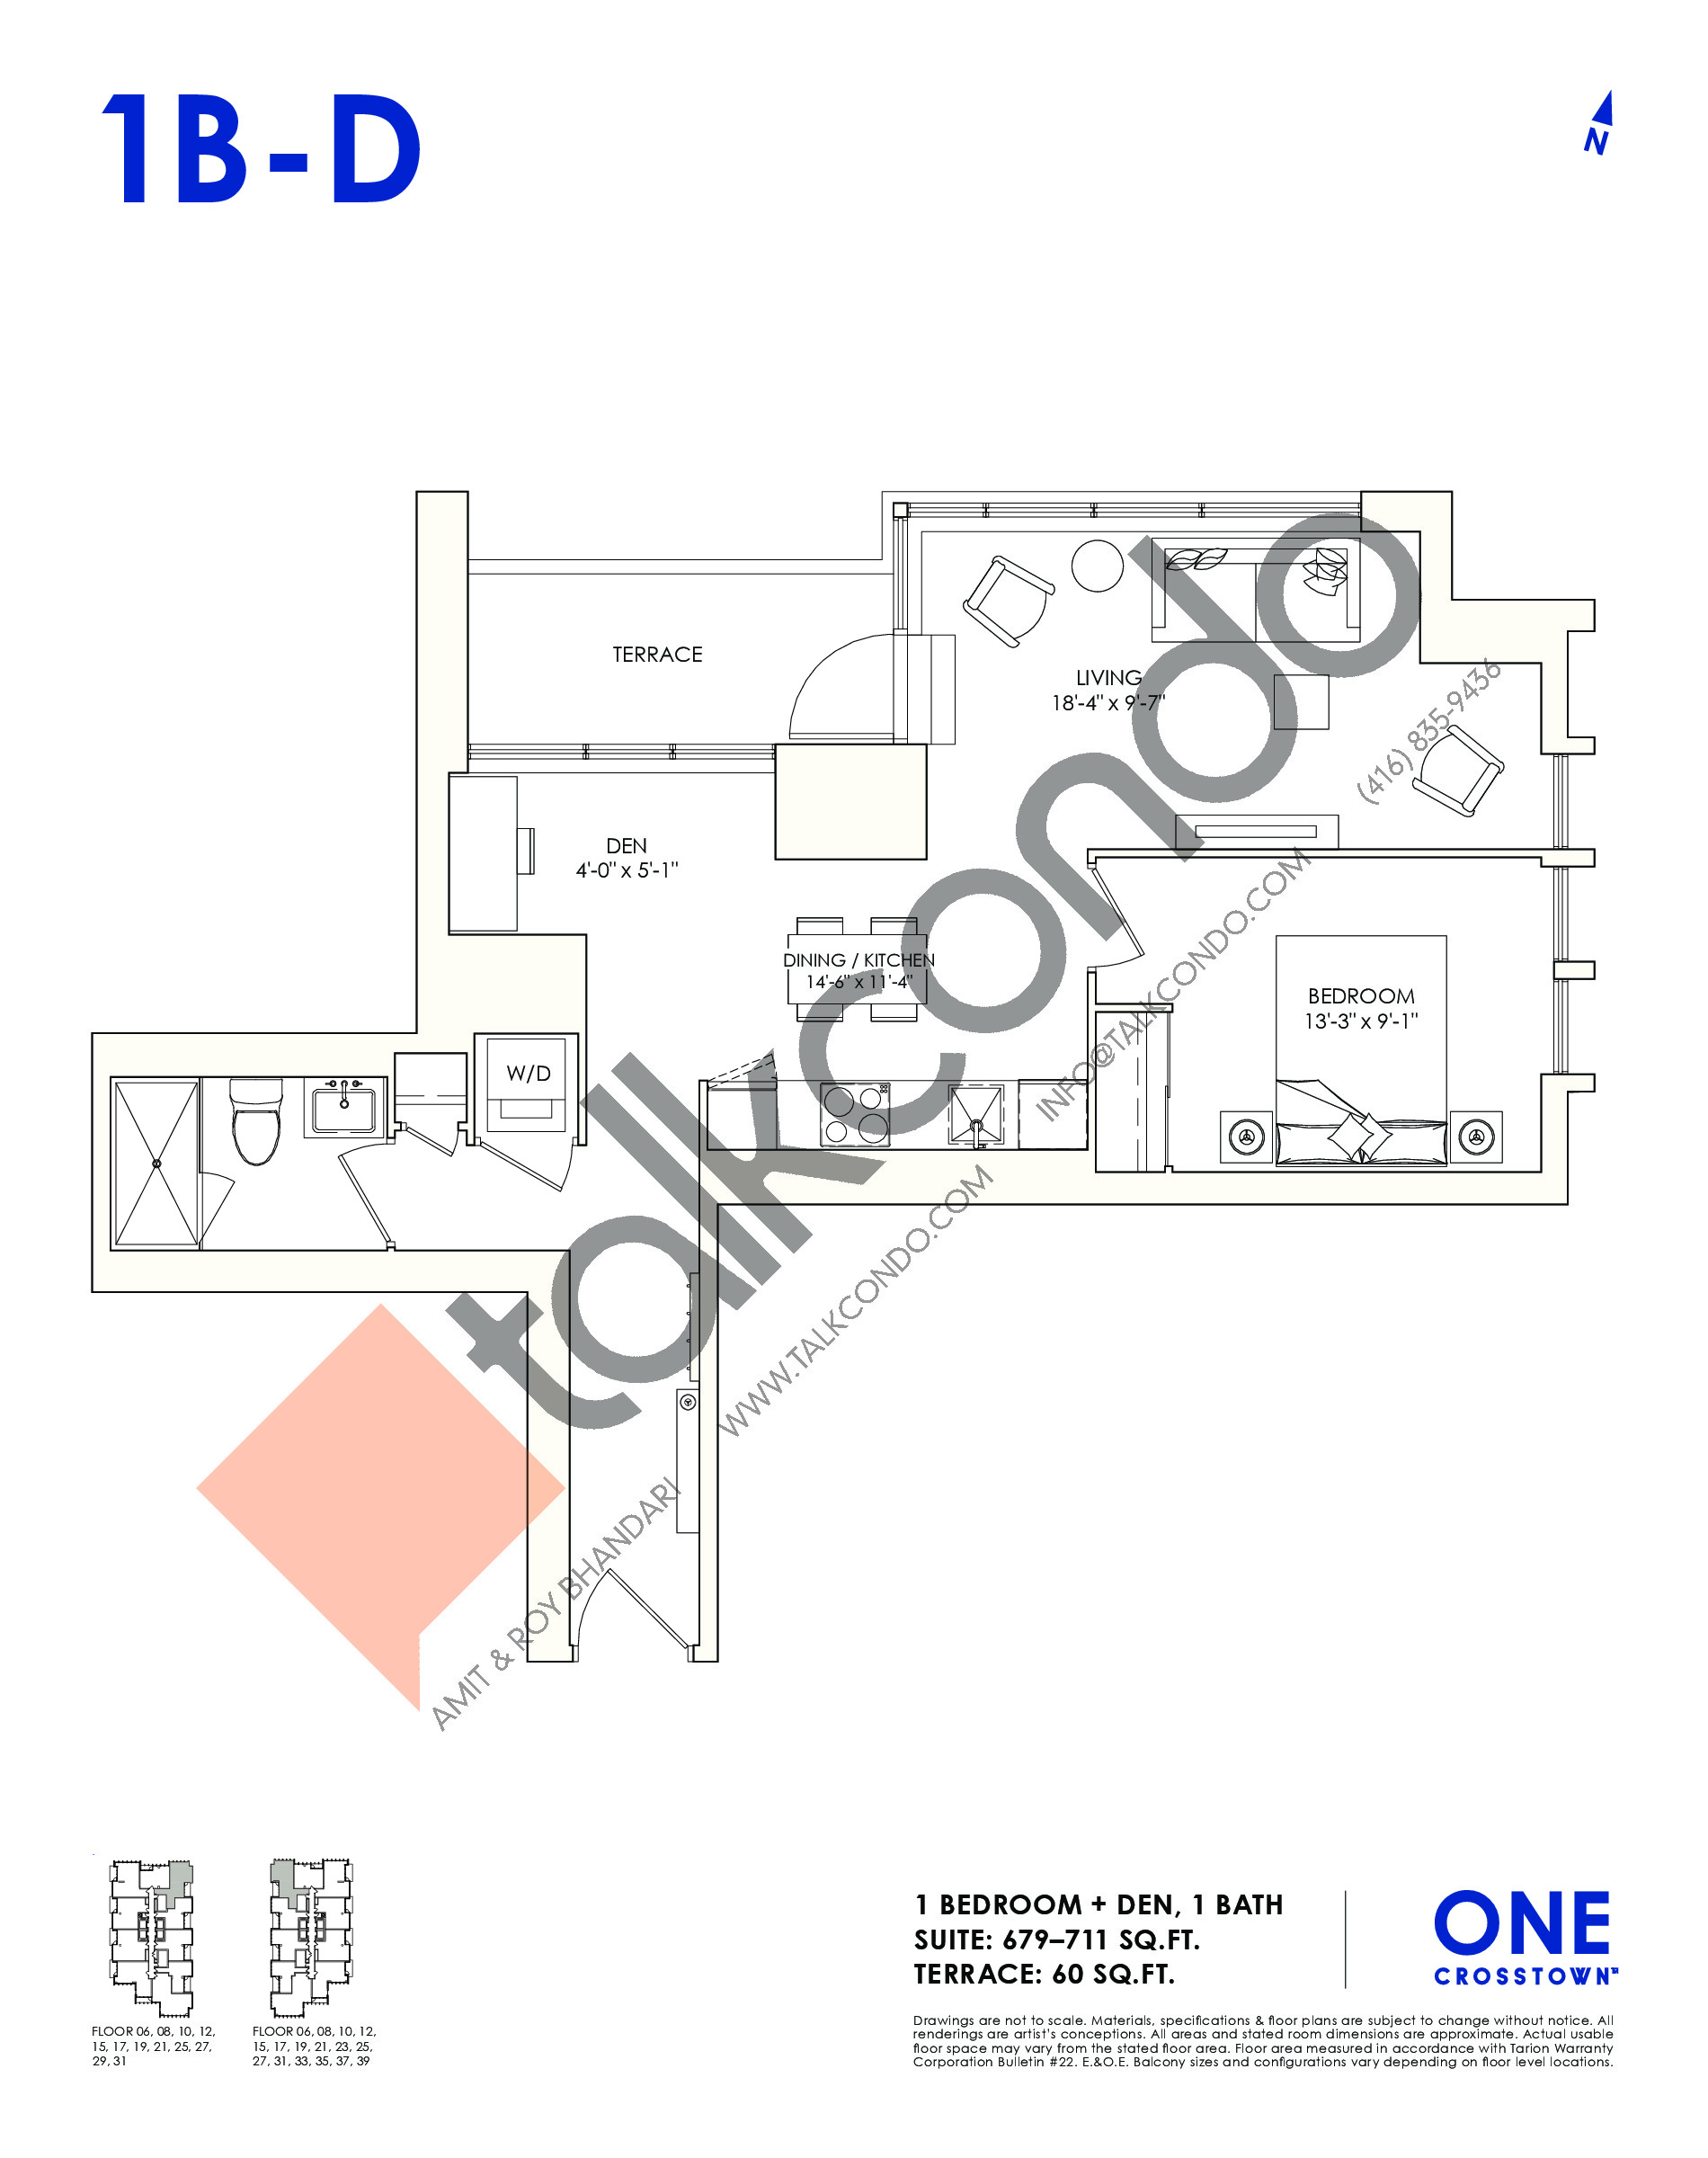 1B-D Floor Plan at One Crosstown Condos - 711 sq.ft